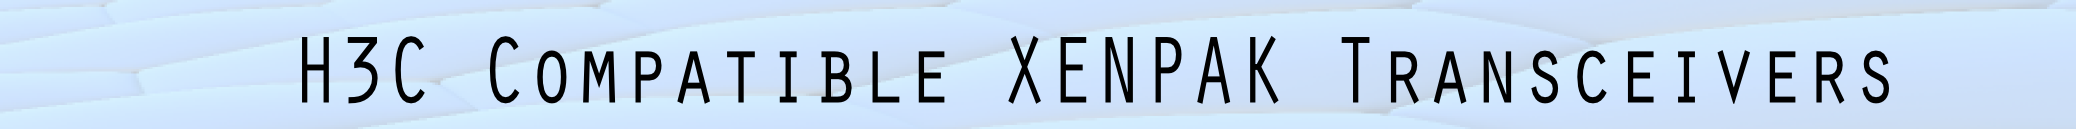 H3C 10-Gigabit Ethernet Fiber Optical XENPAK Transceiver Modules